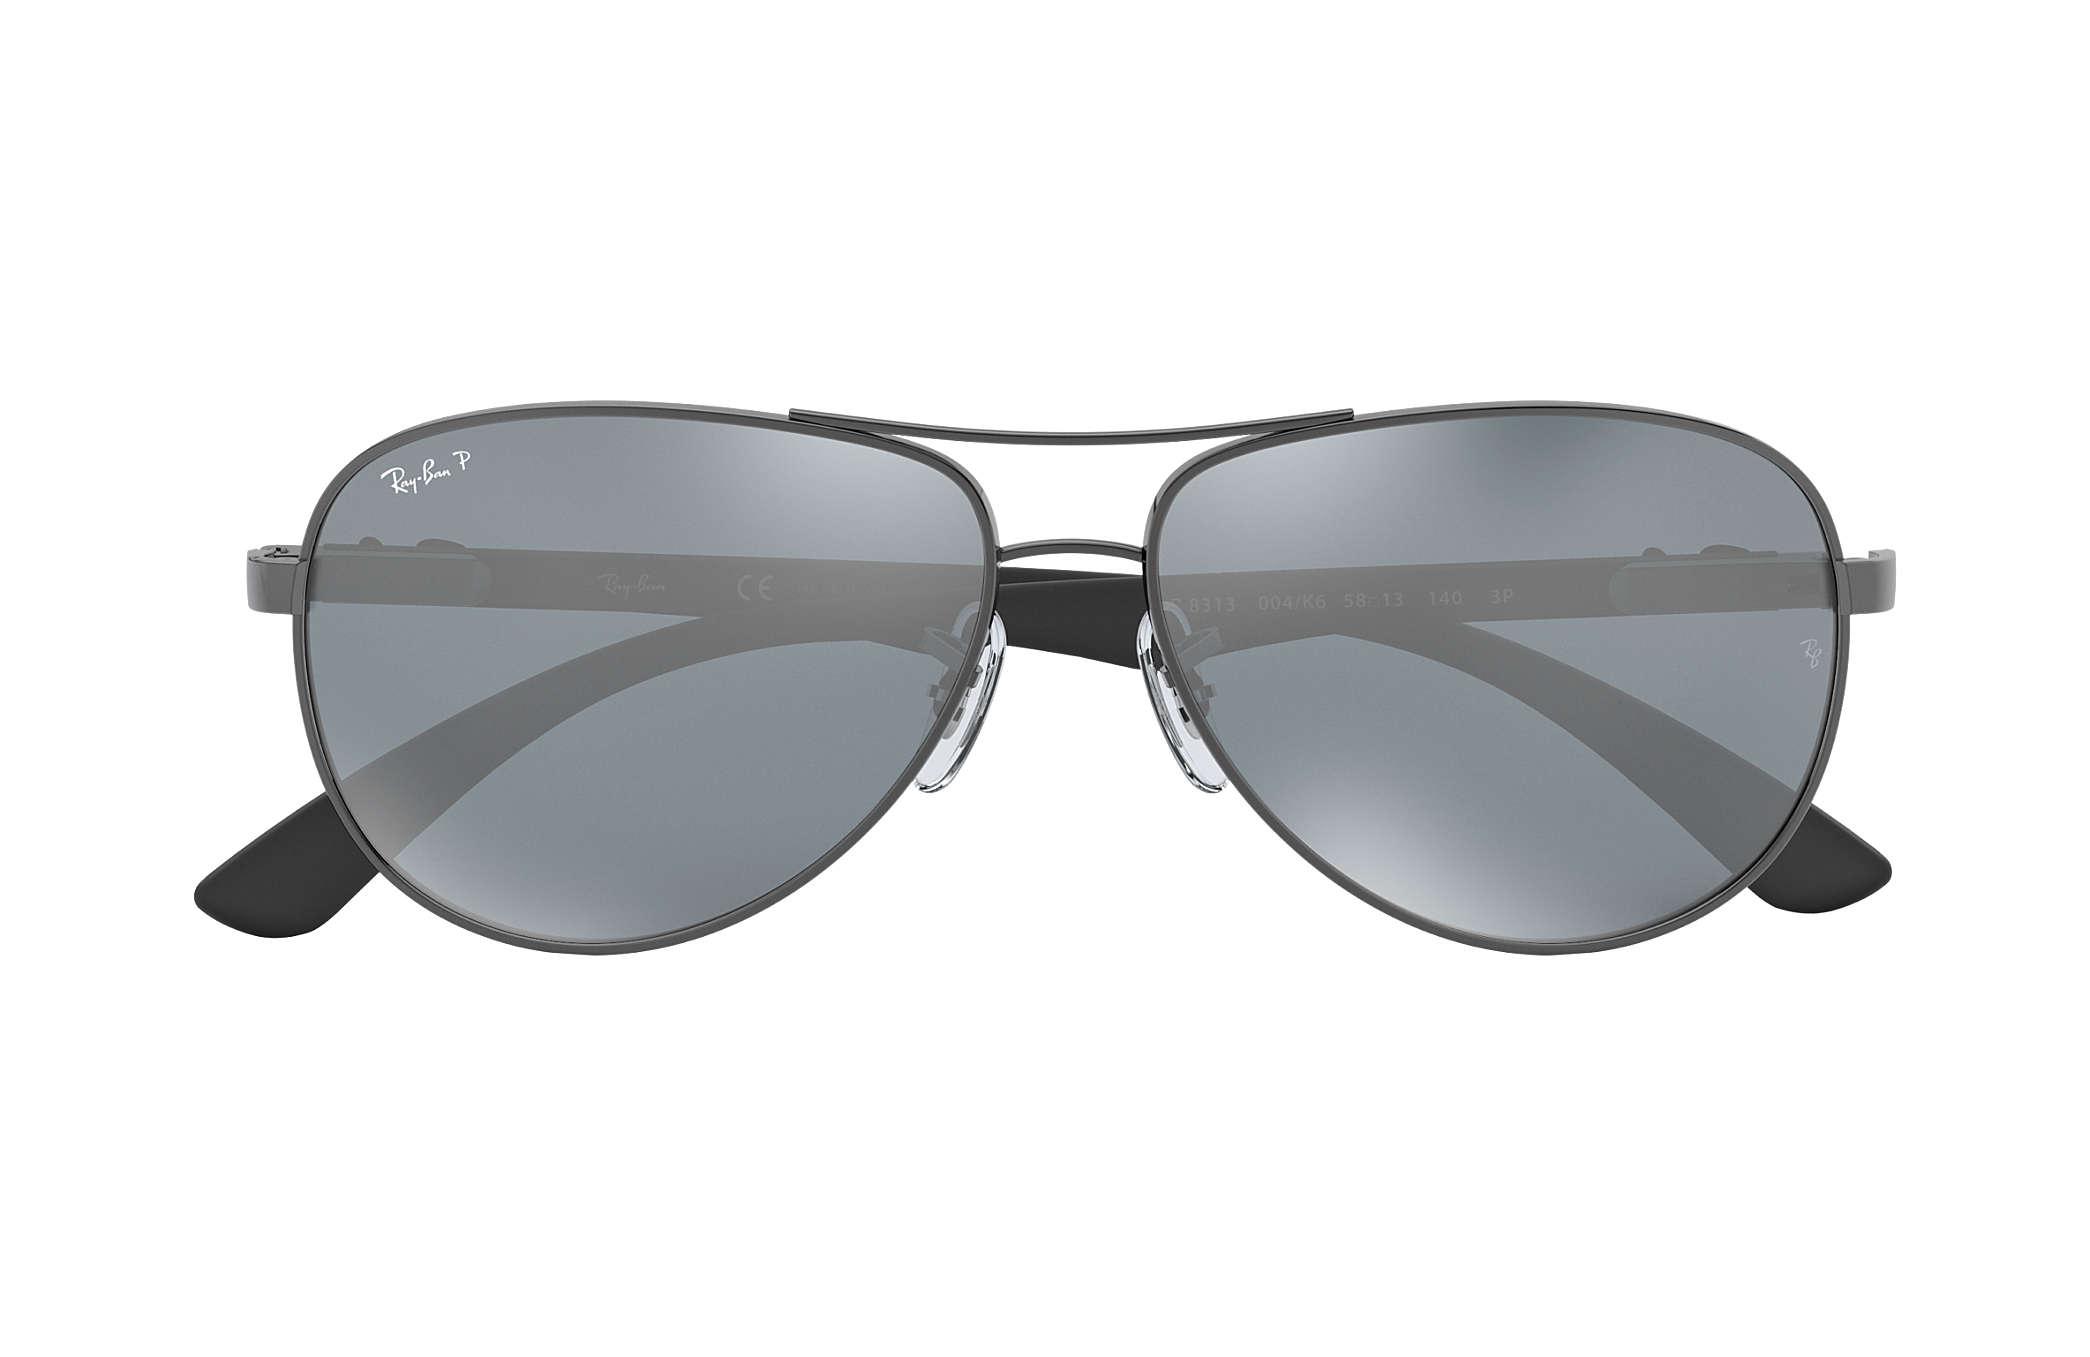 8b93bd9a0d6 Ray-Ban RB8313 Gunmetal - Carbon Fibre - Silver Polarized Lenses ...